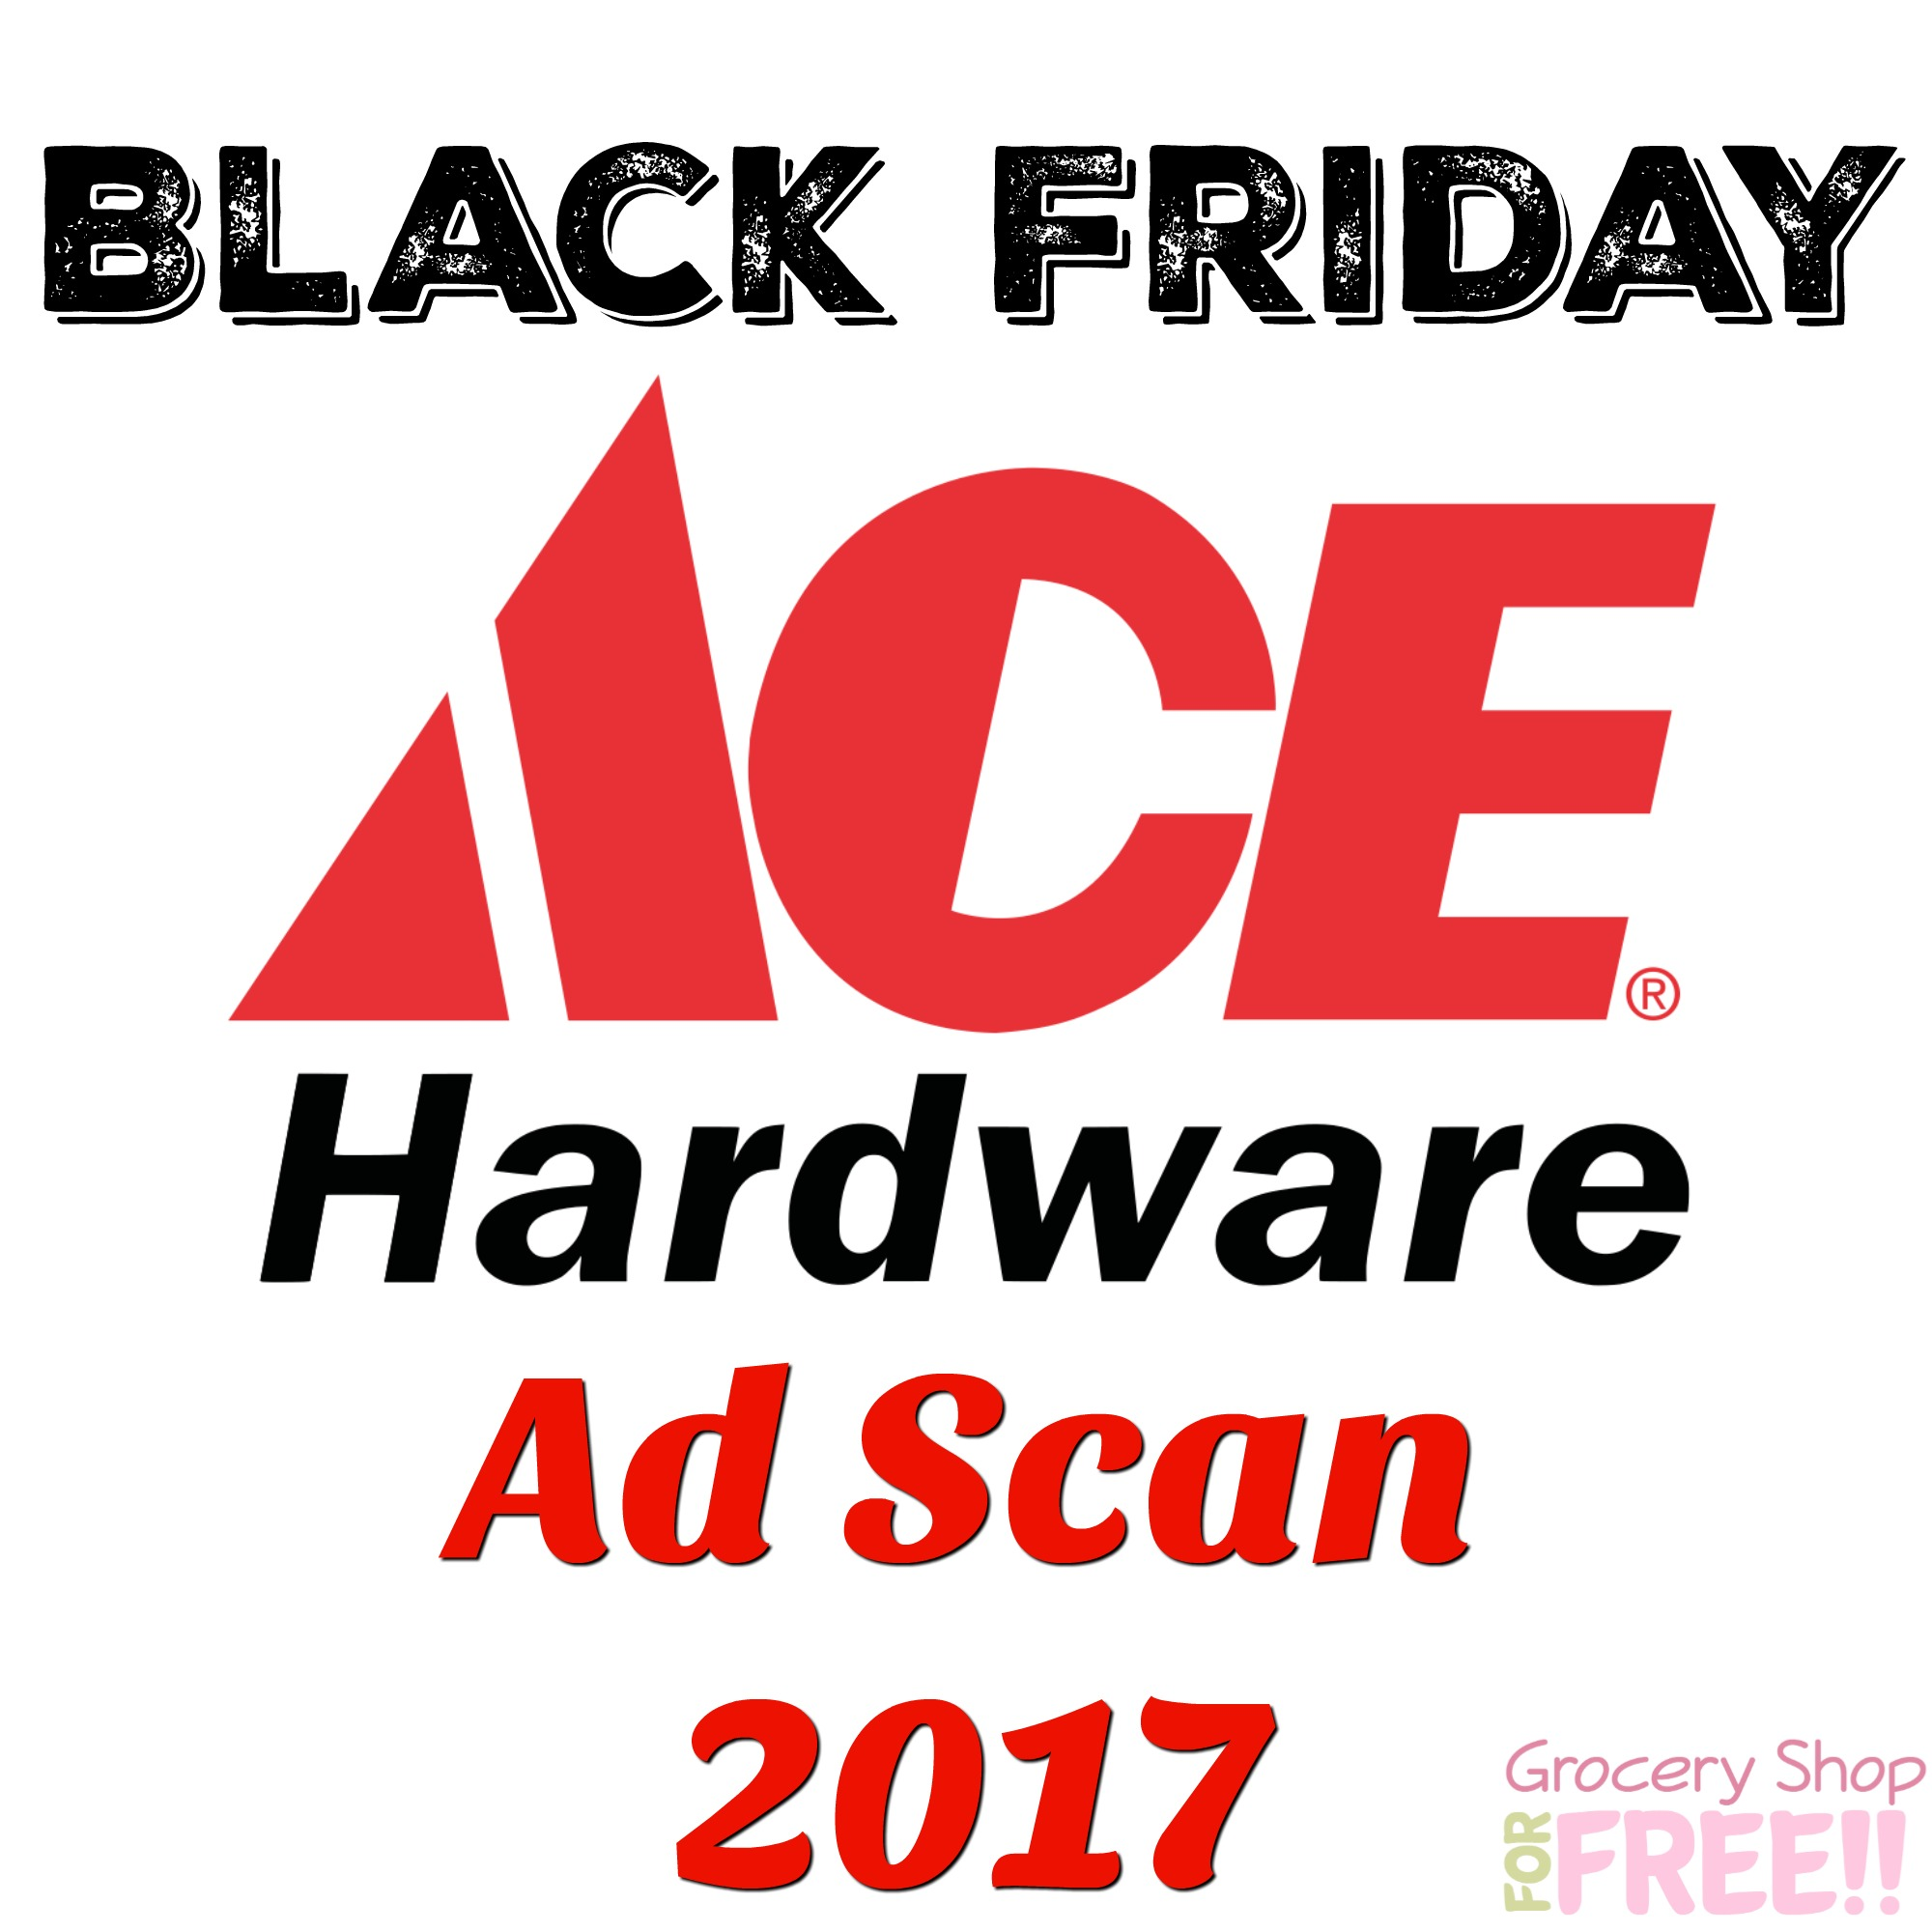 Ace HardwareBlack Friday Ad 2017 Scan